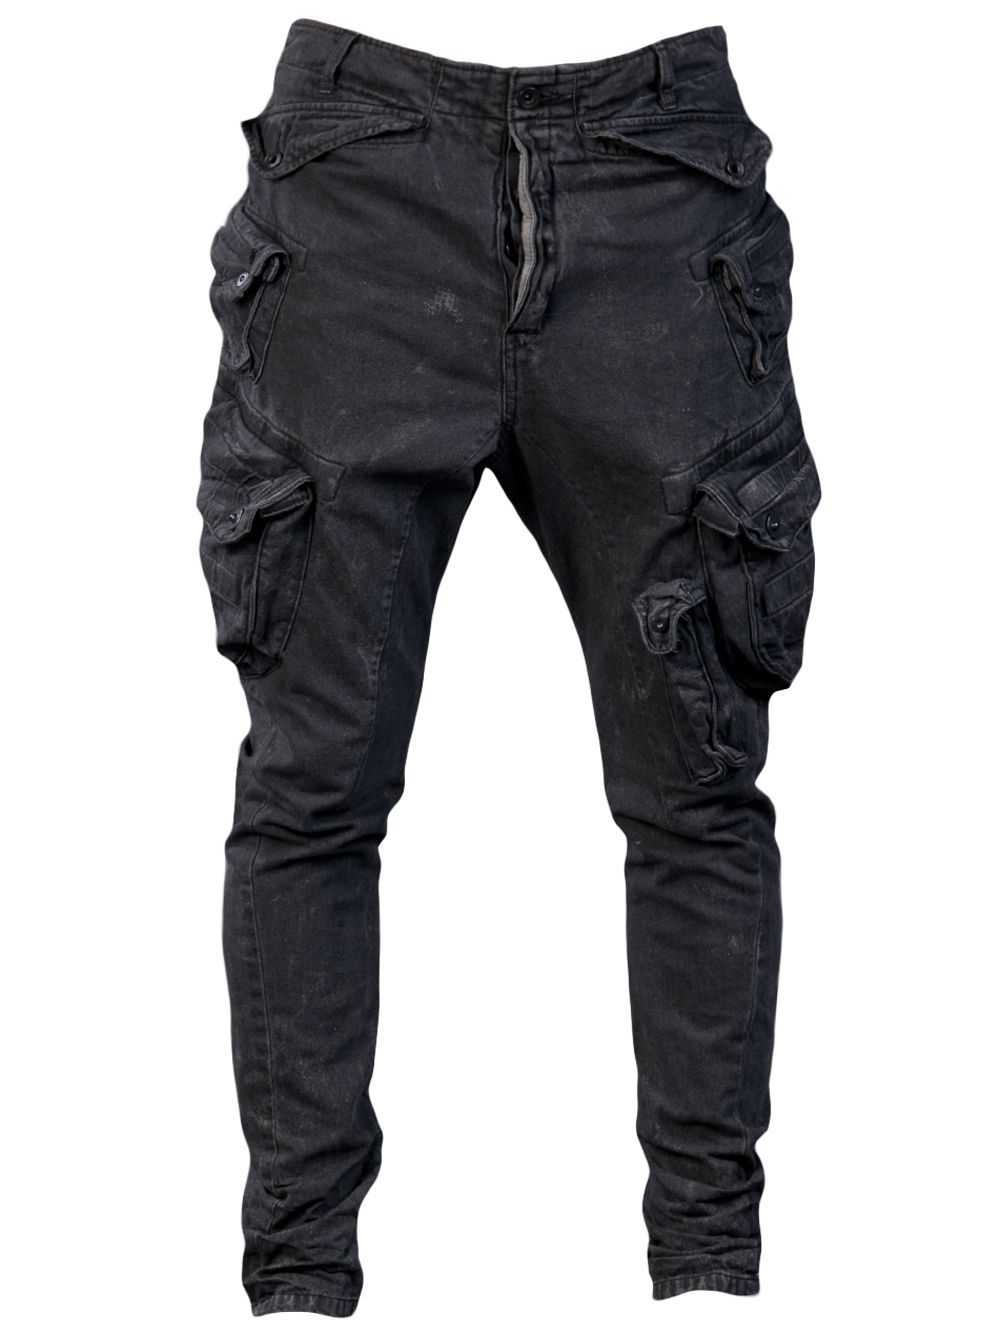 Cool Men/'s Multi Cargo Jeans Harem Gothic Punk Slim Fit Biker Casual Pants Denim